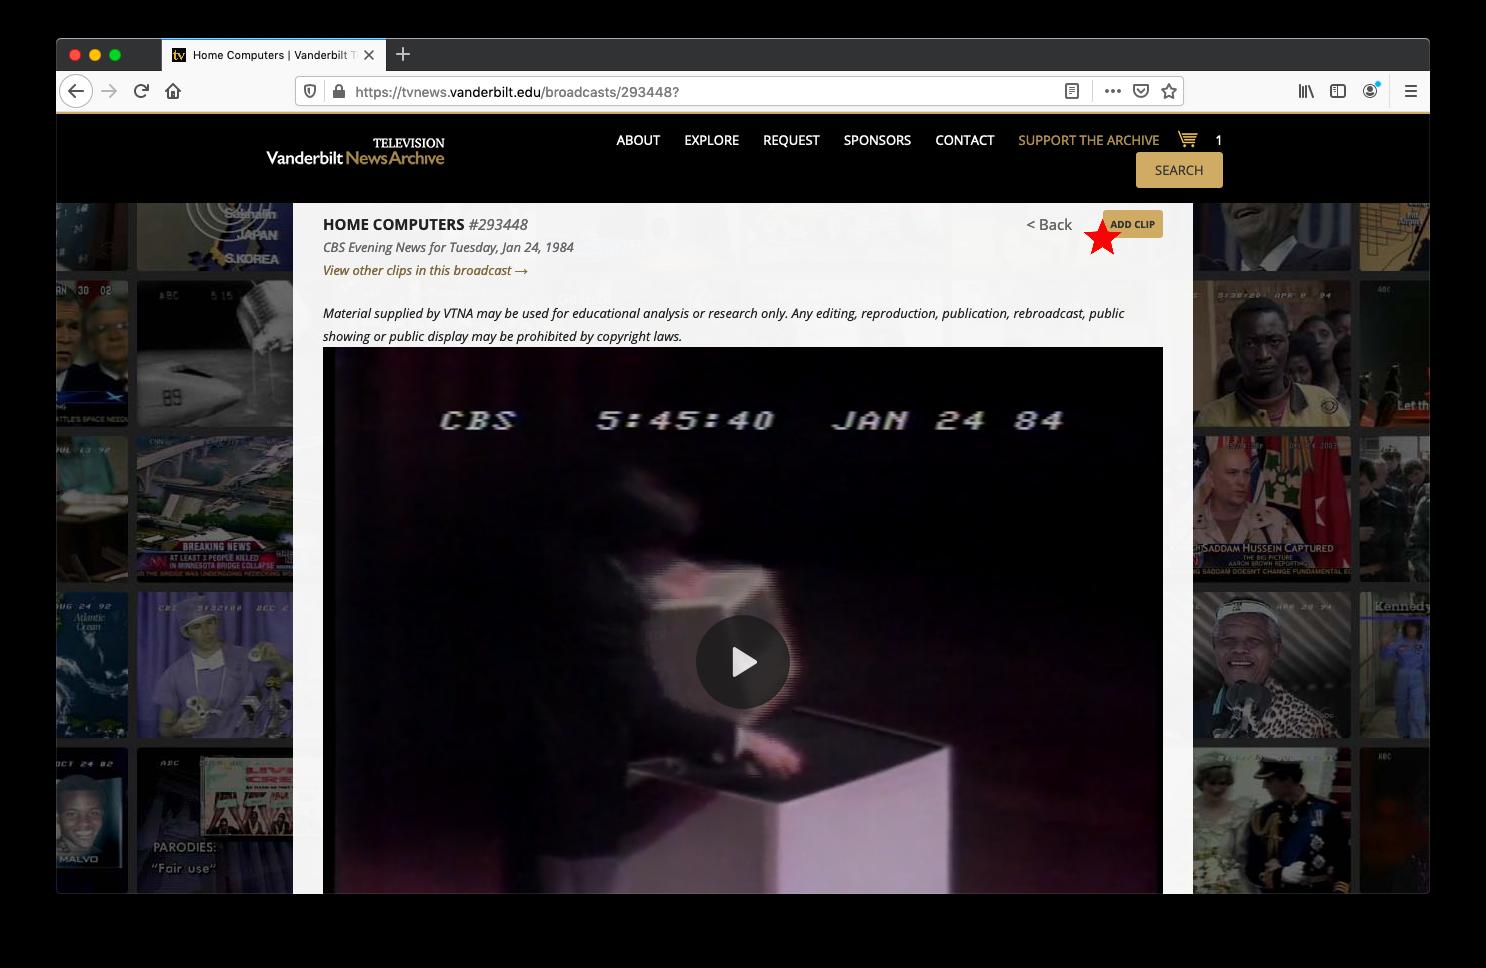 screenshot of clicking add clip